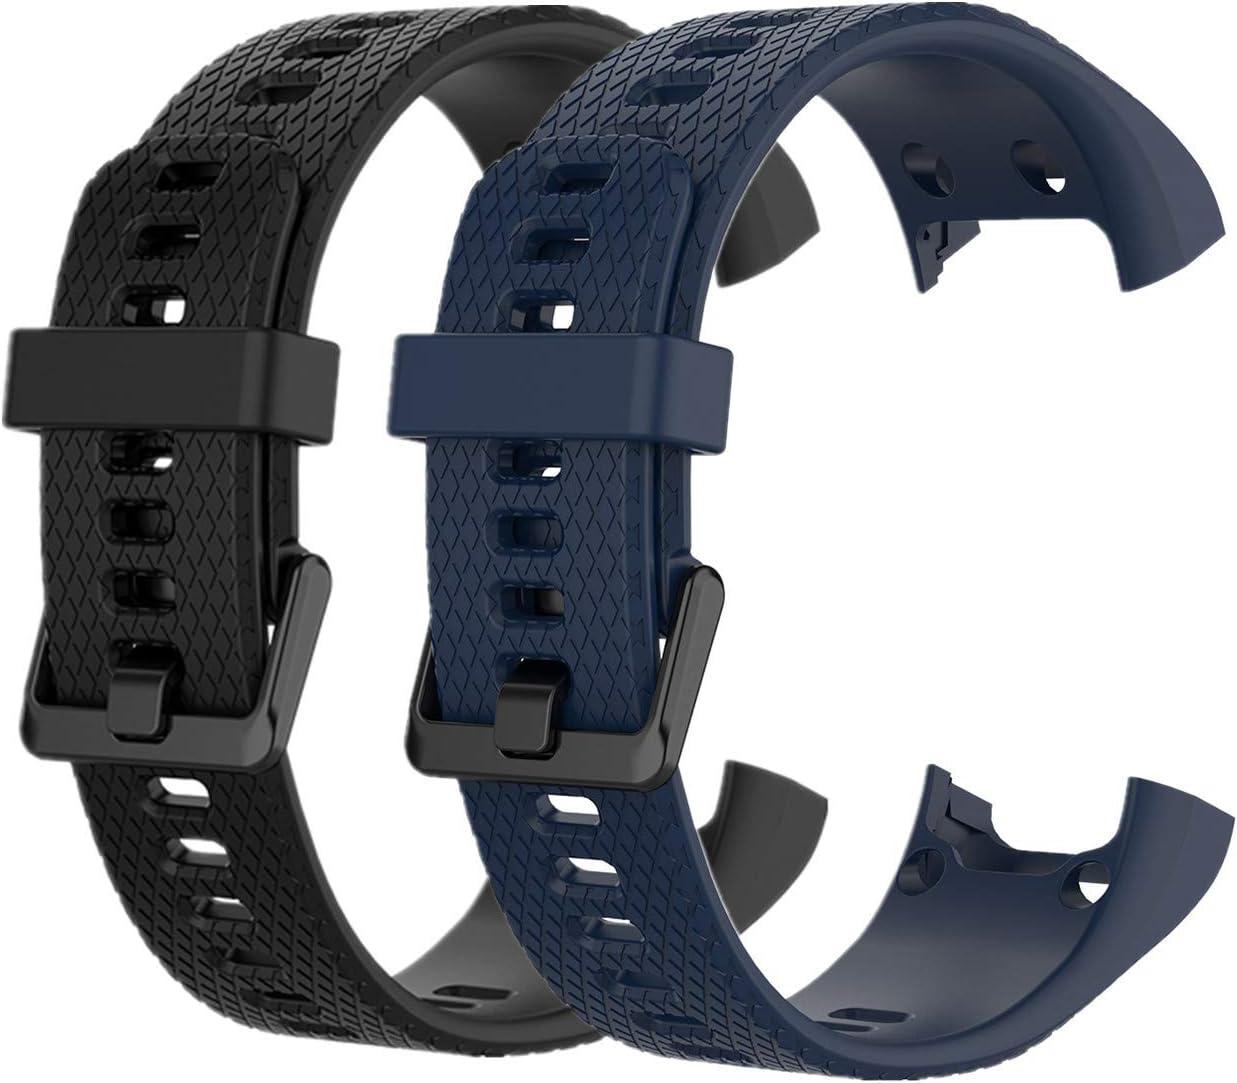 HUABAO Watch Strap Compatible with vivosmart Garmin Excellent Adjustabl HR Time sale